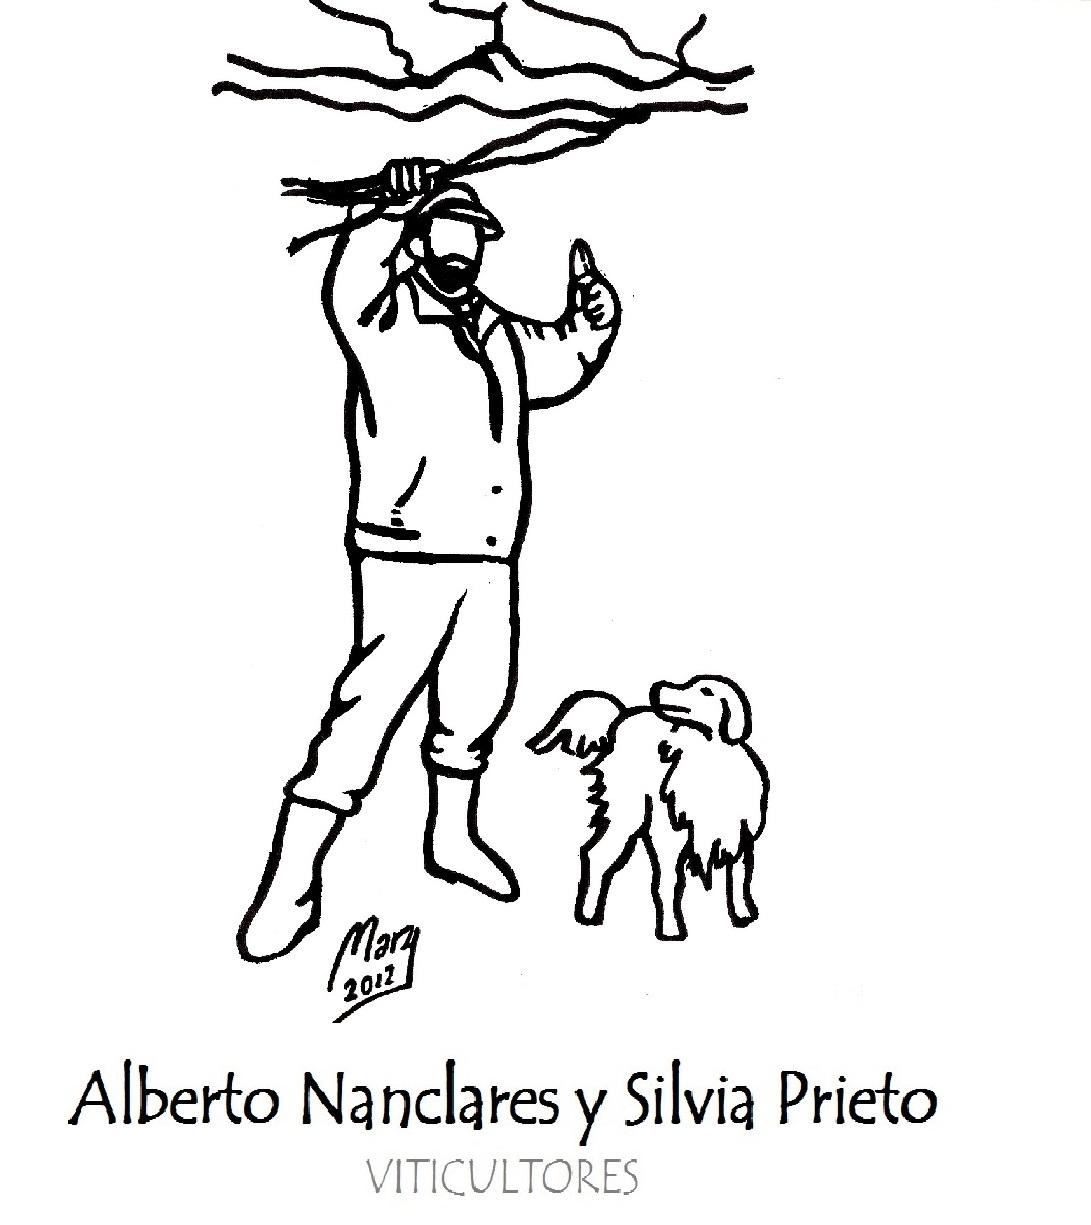 Alberto Nanclares y Silvia Prieto